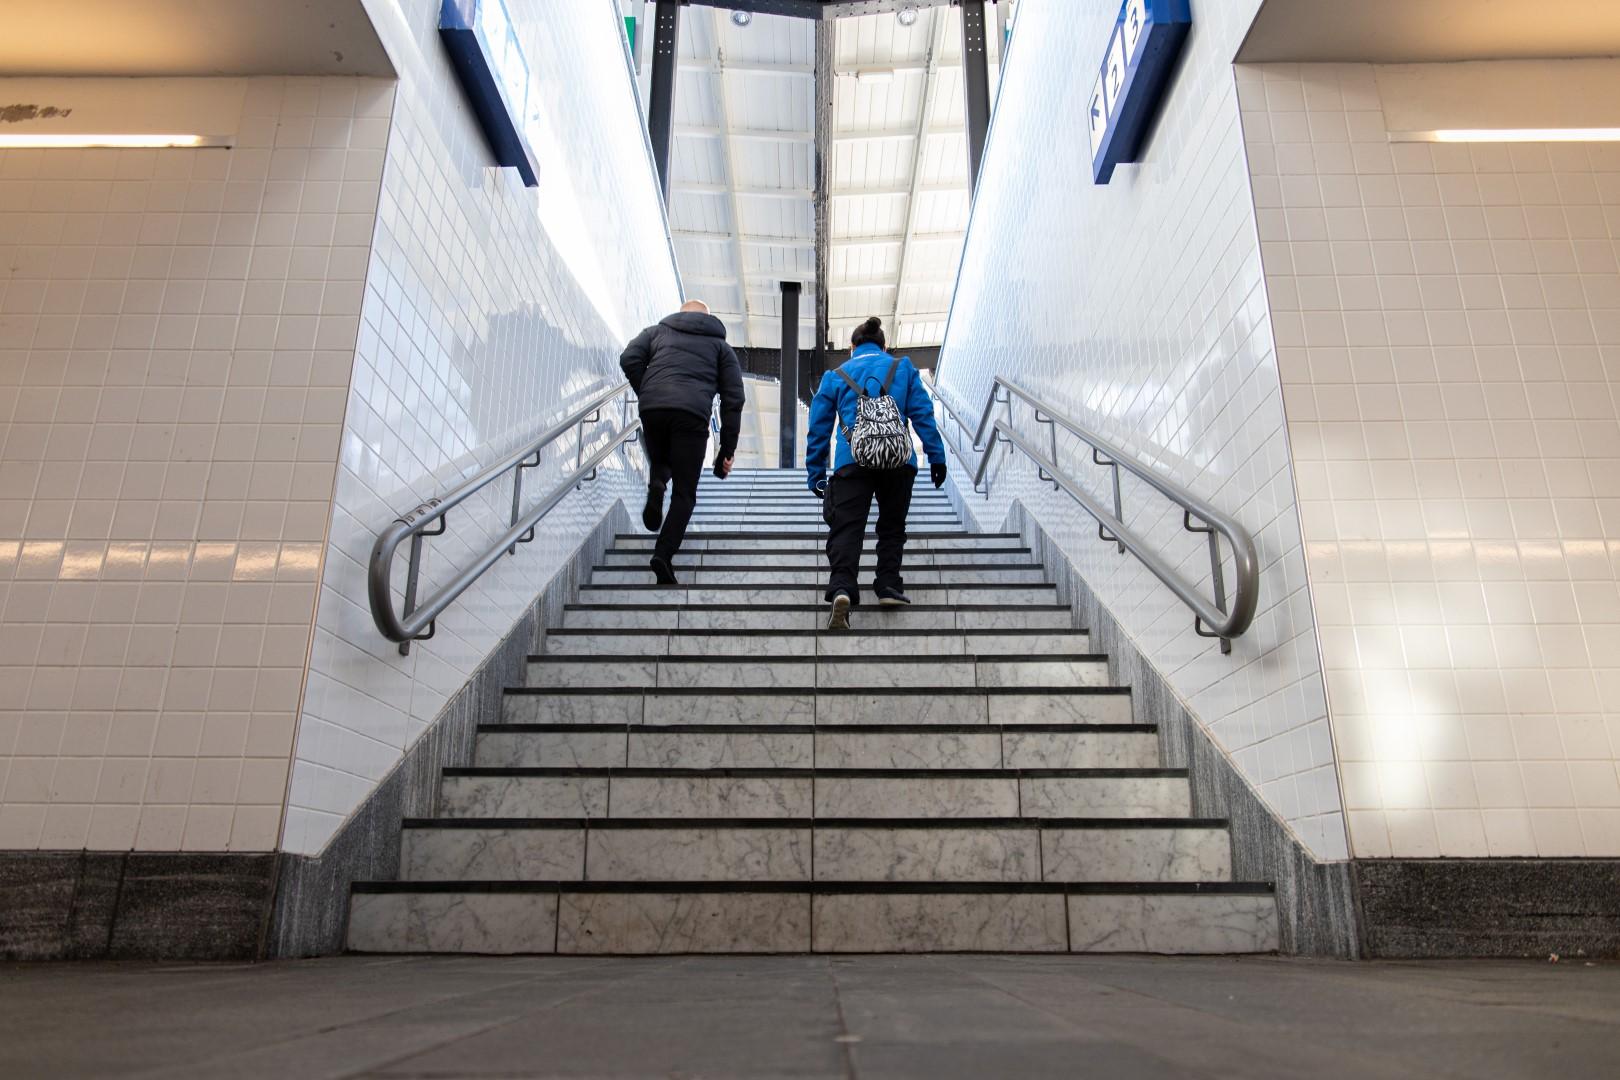 Station stationsstraat perron tunnel trap trapje trein